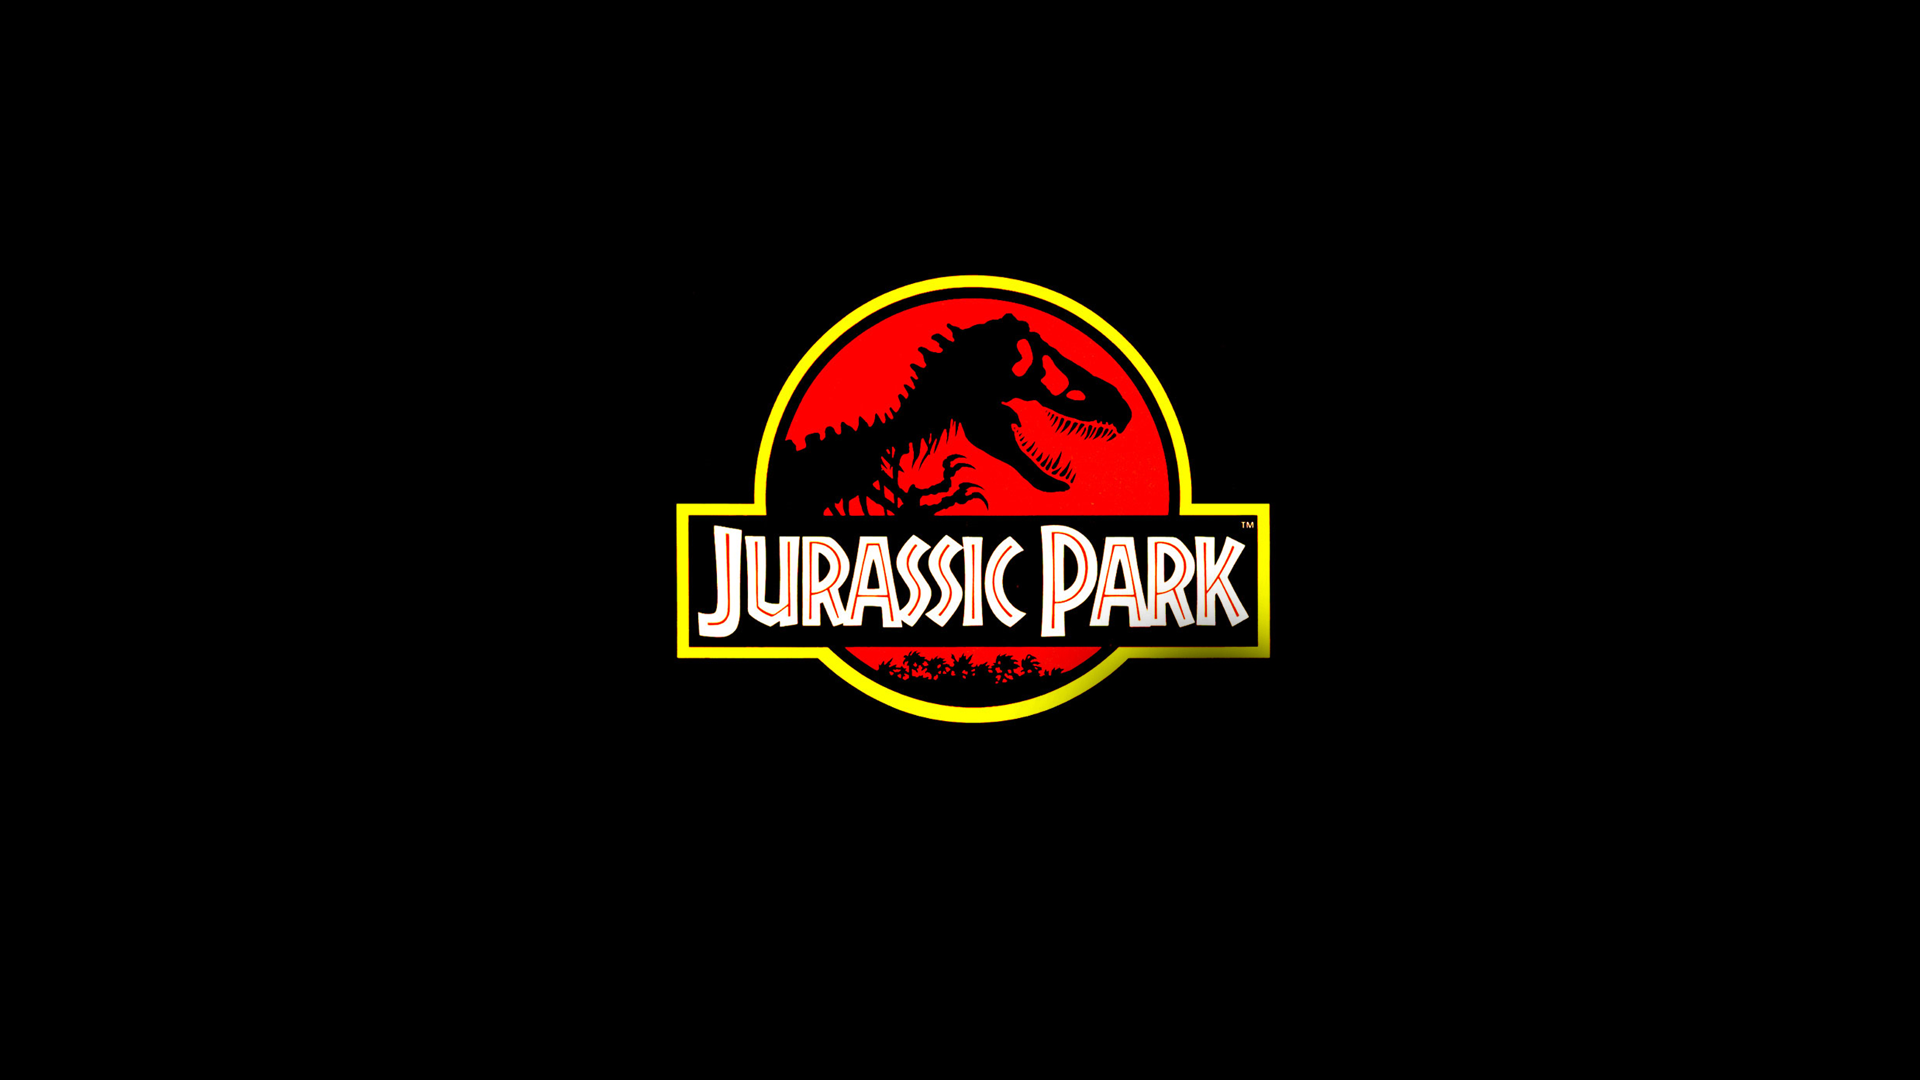 Jurassic Park Logo Wallpaper - WallpaperSafari